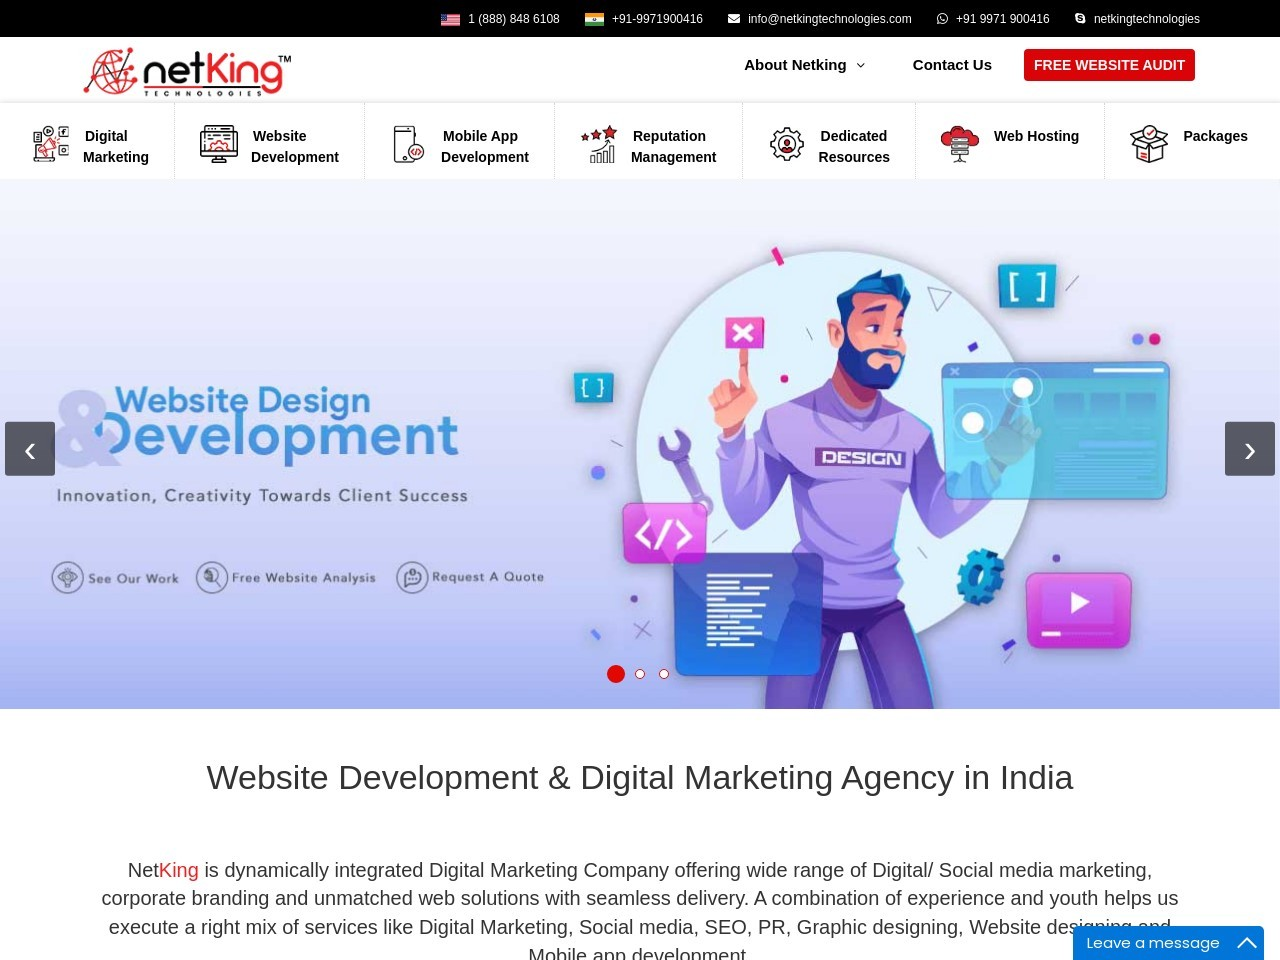 PPC Services India | Pay Per Click (PPC) Company India